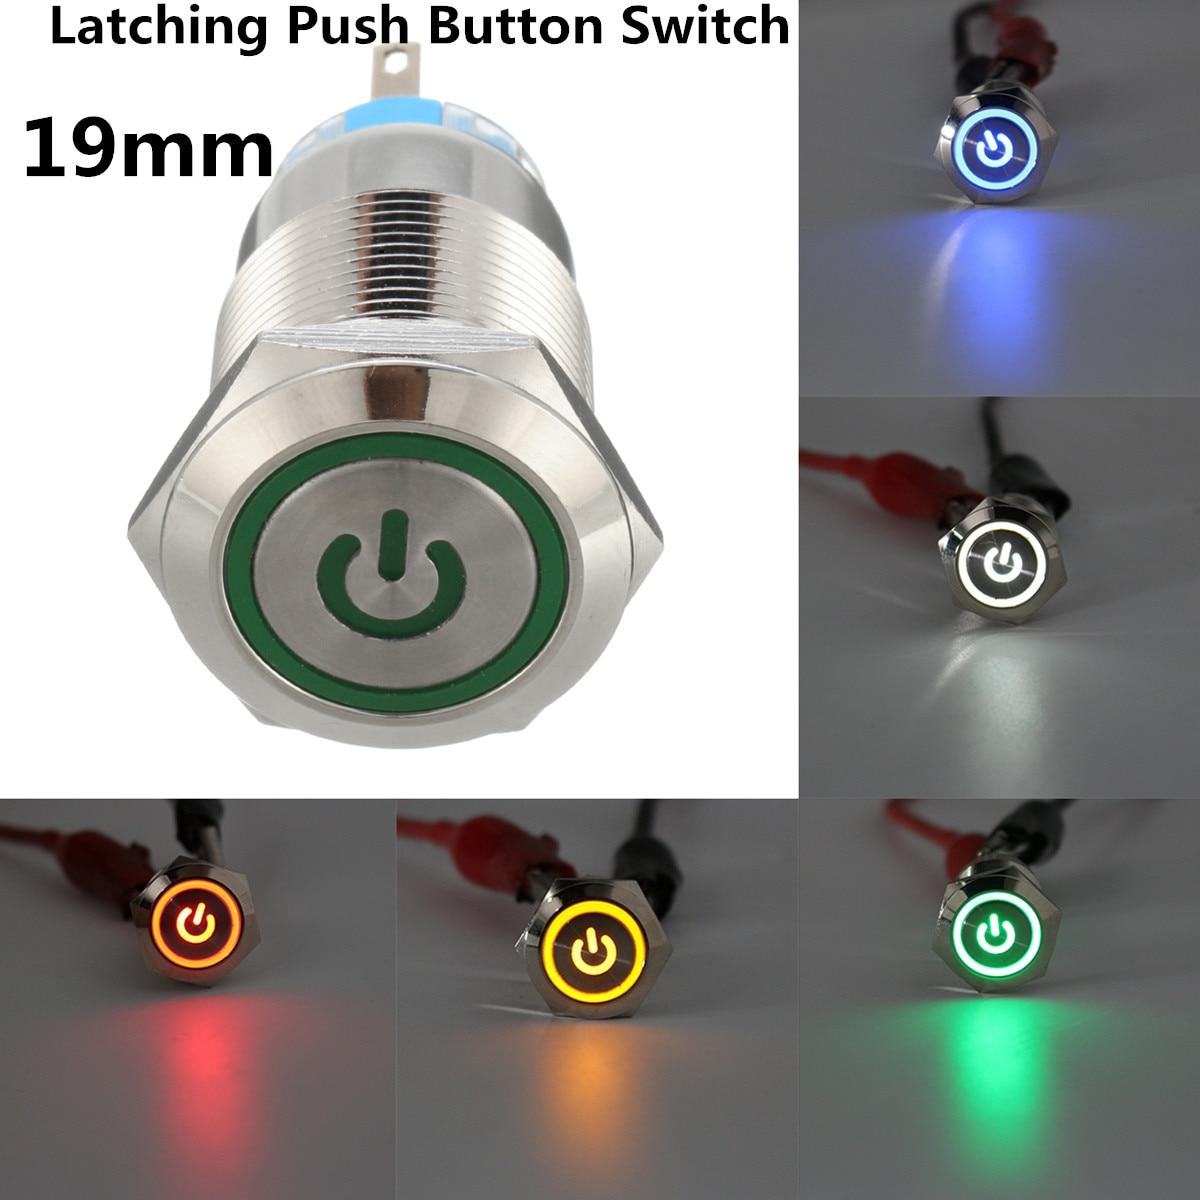 12mm Led Power Push Button Switch Waterproof Metal Momentary Type In Dc 24v Selflock Light Latching 12v 5pin 19mm Ledlatching Universal Car Self Locking